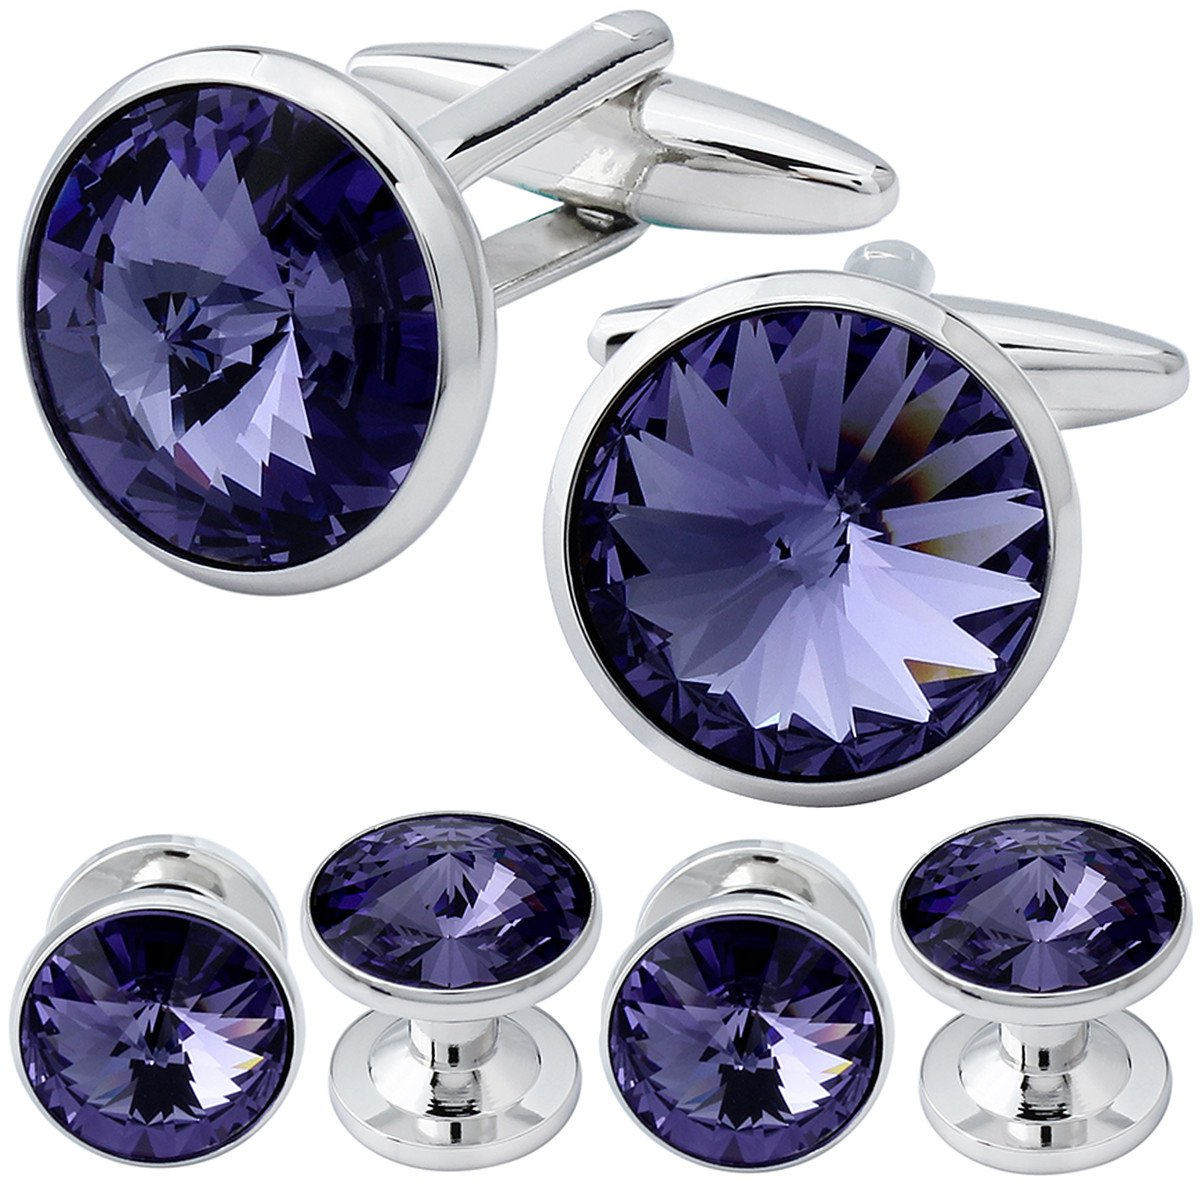 HAWSON Cufflink and Studs Tuxedo Set Silver Color with Swarovski Crystals in Purple